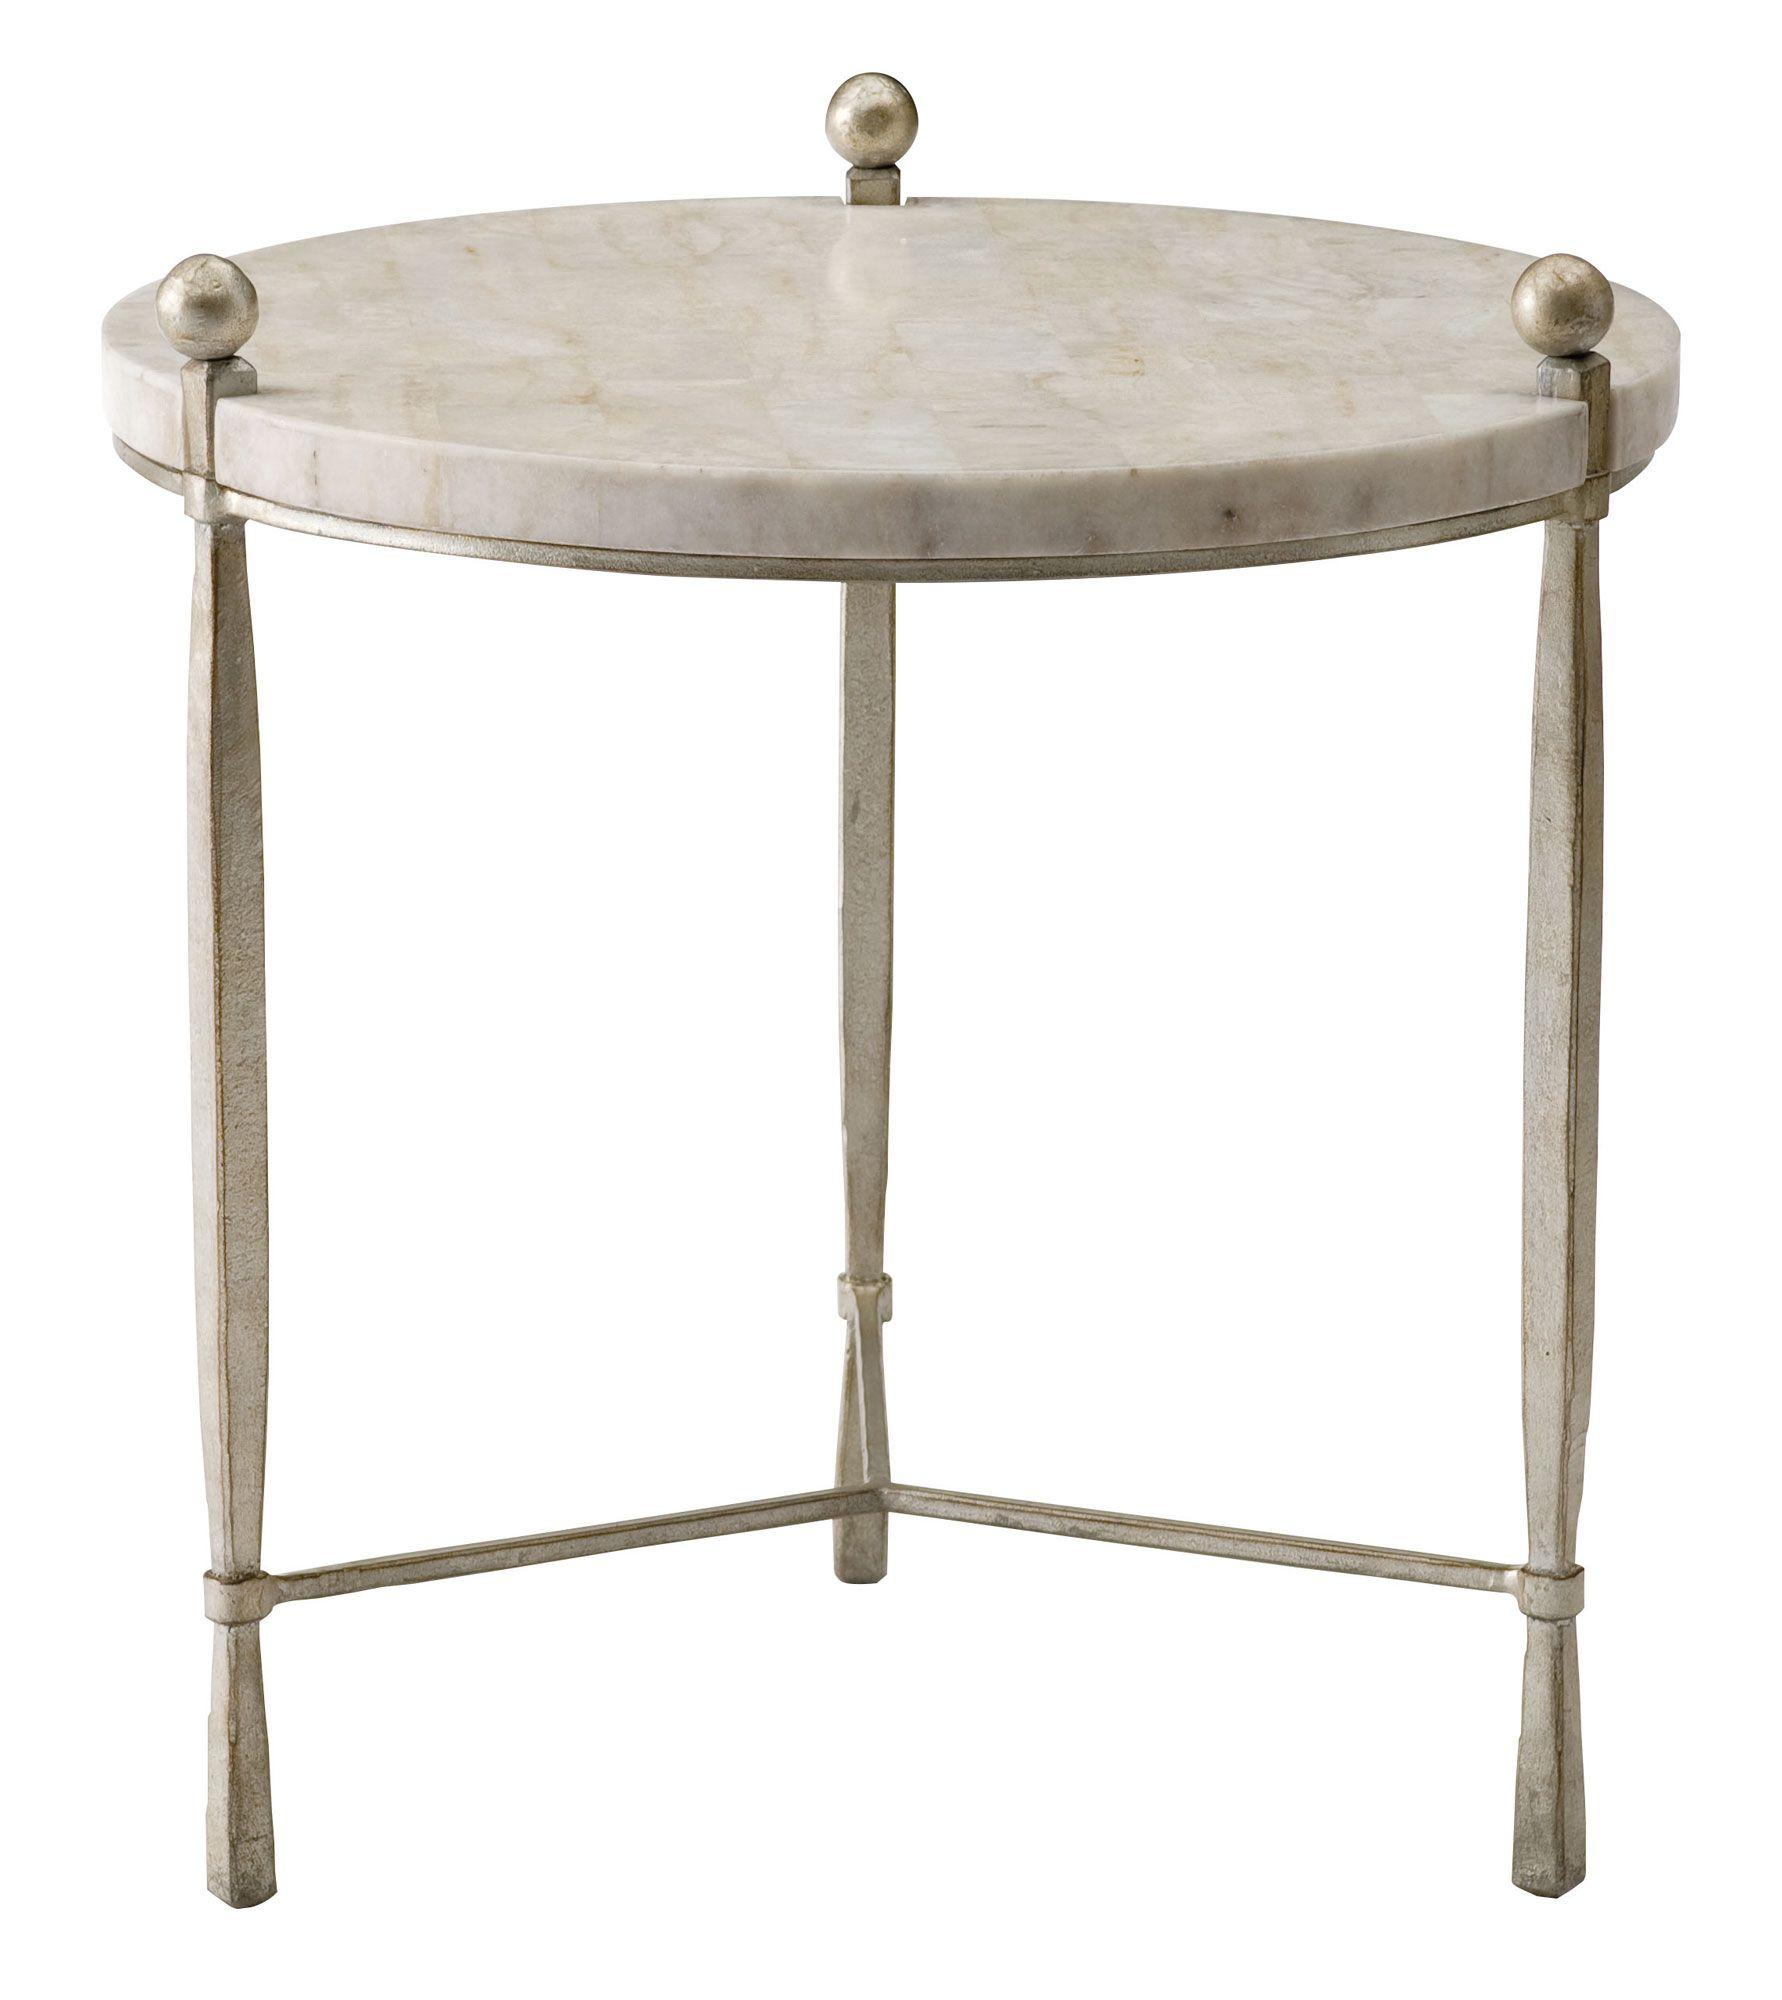 563 122 Clarion Round Chairside Table | Bernhardt Dia 24.5 H 26 White Stone  Top #LightFinish $1387.50 #2Foot